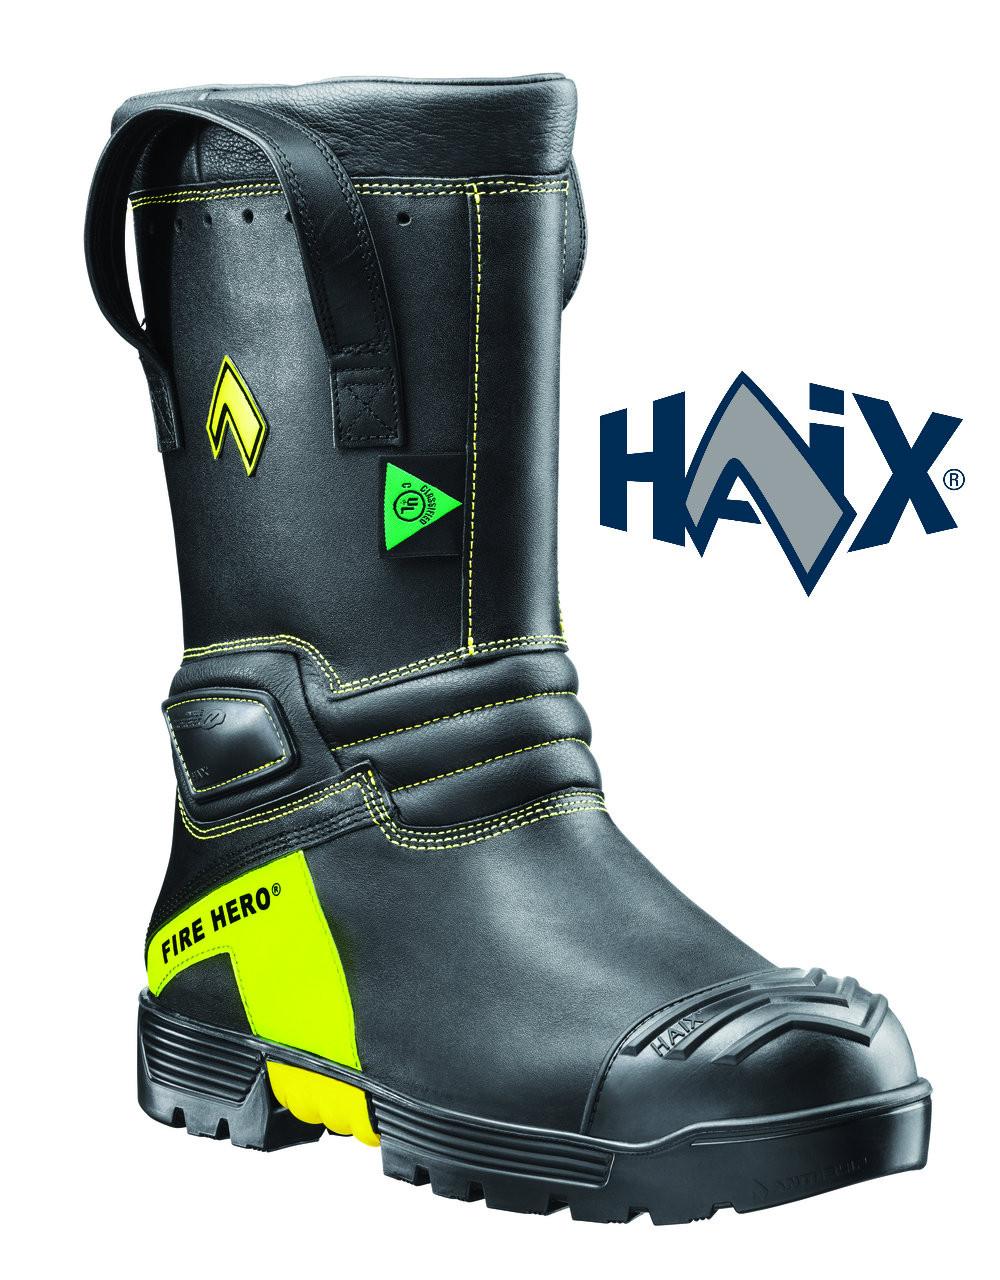 fa7a67a5309 Haix 507102 Women's Fire Hero Xtreme Boots